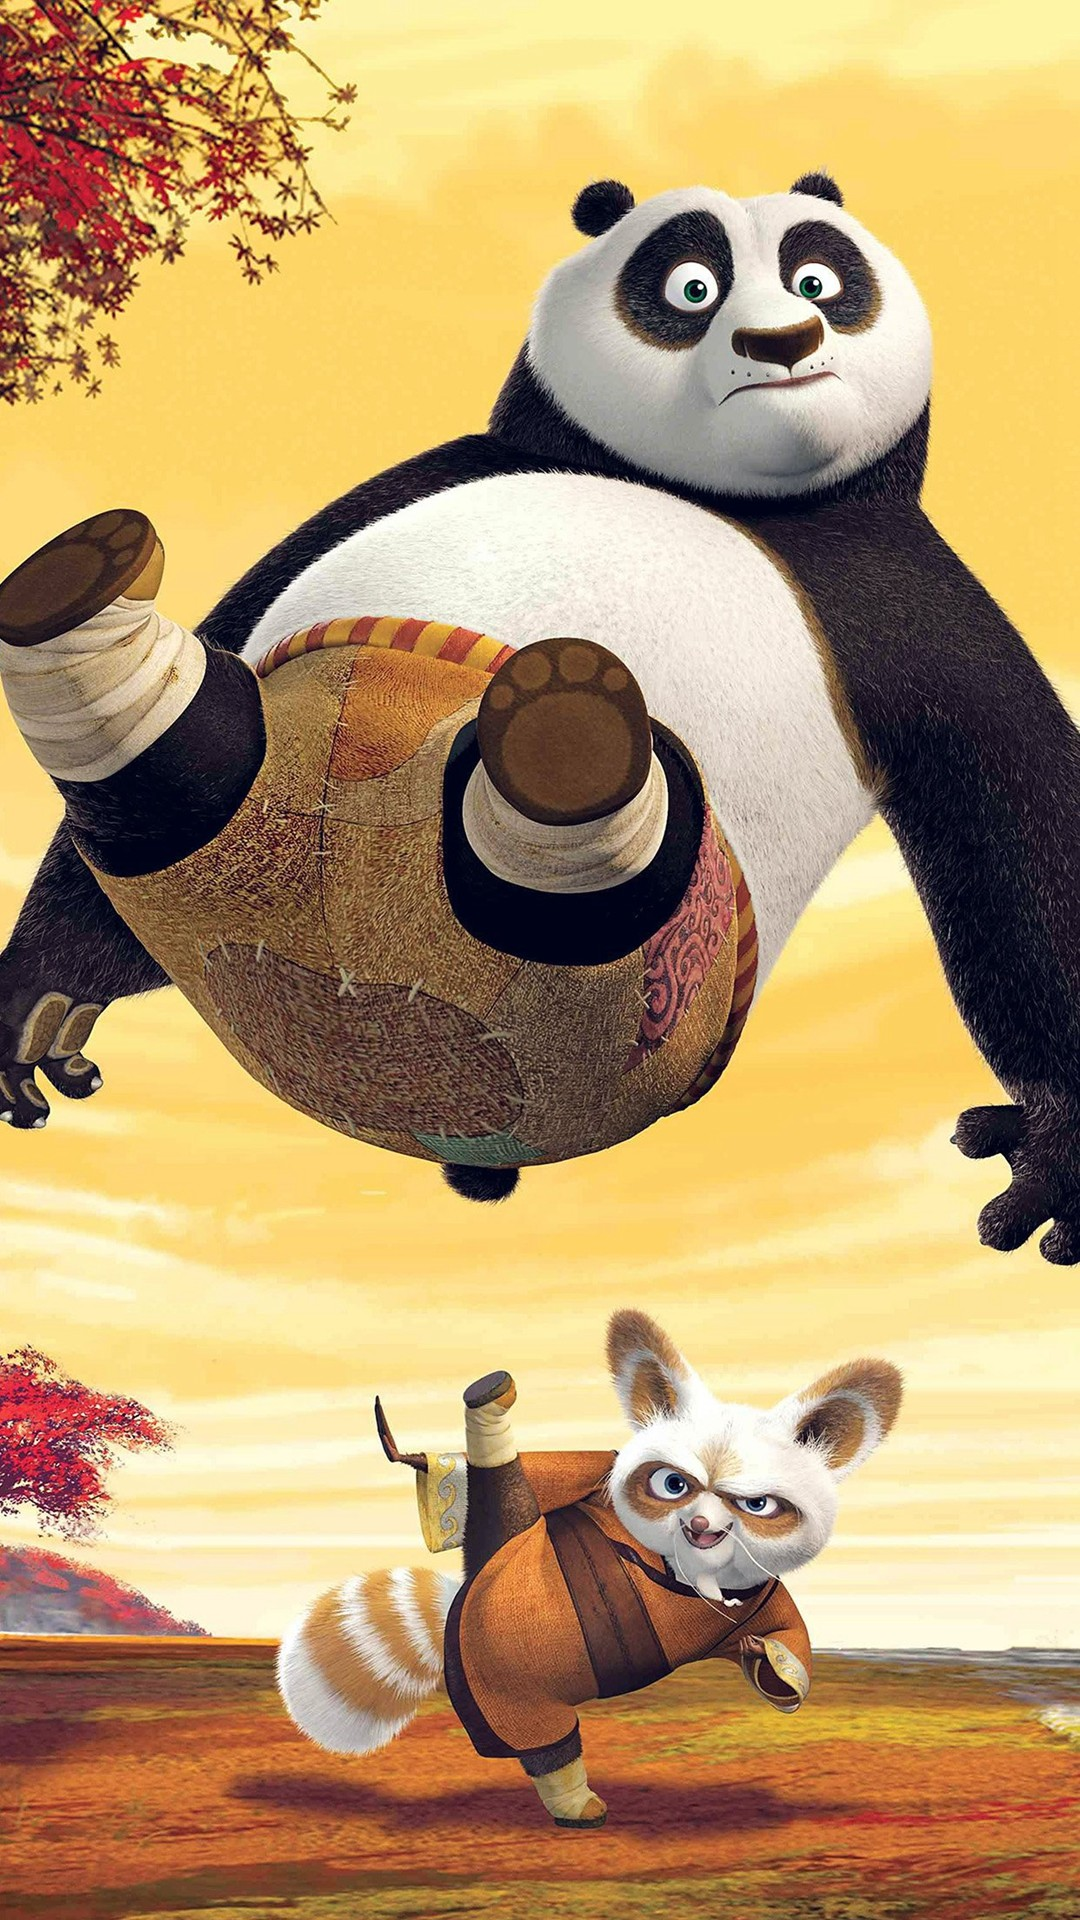 Kungfu Panda Dreamworks Art Kick Cute Anime #iPhone #6 #plus #wallpaper